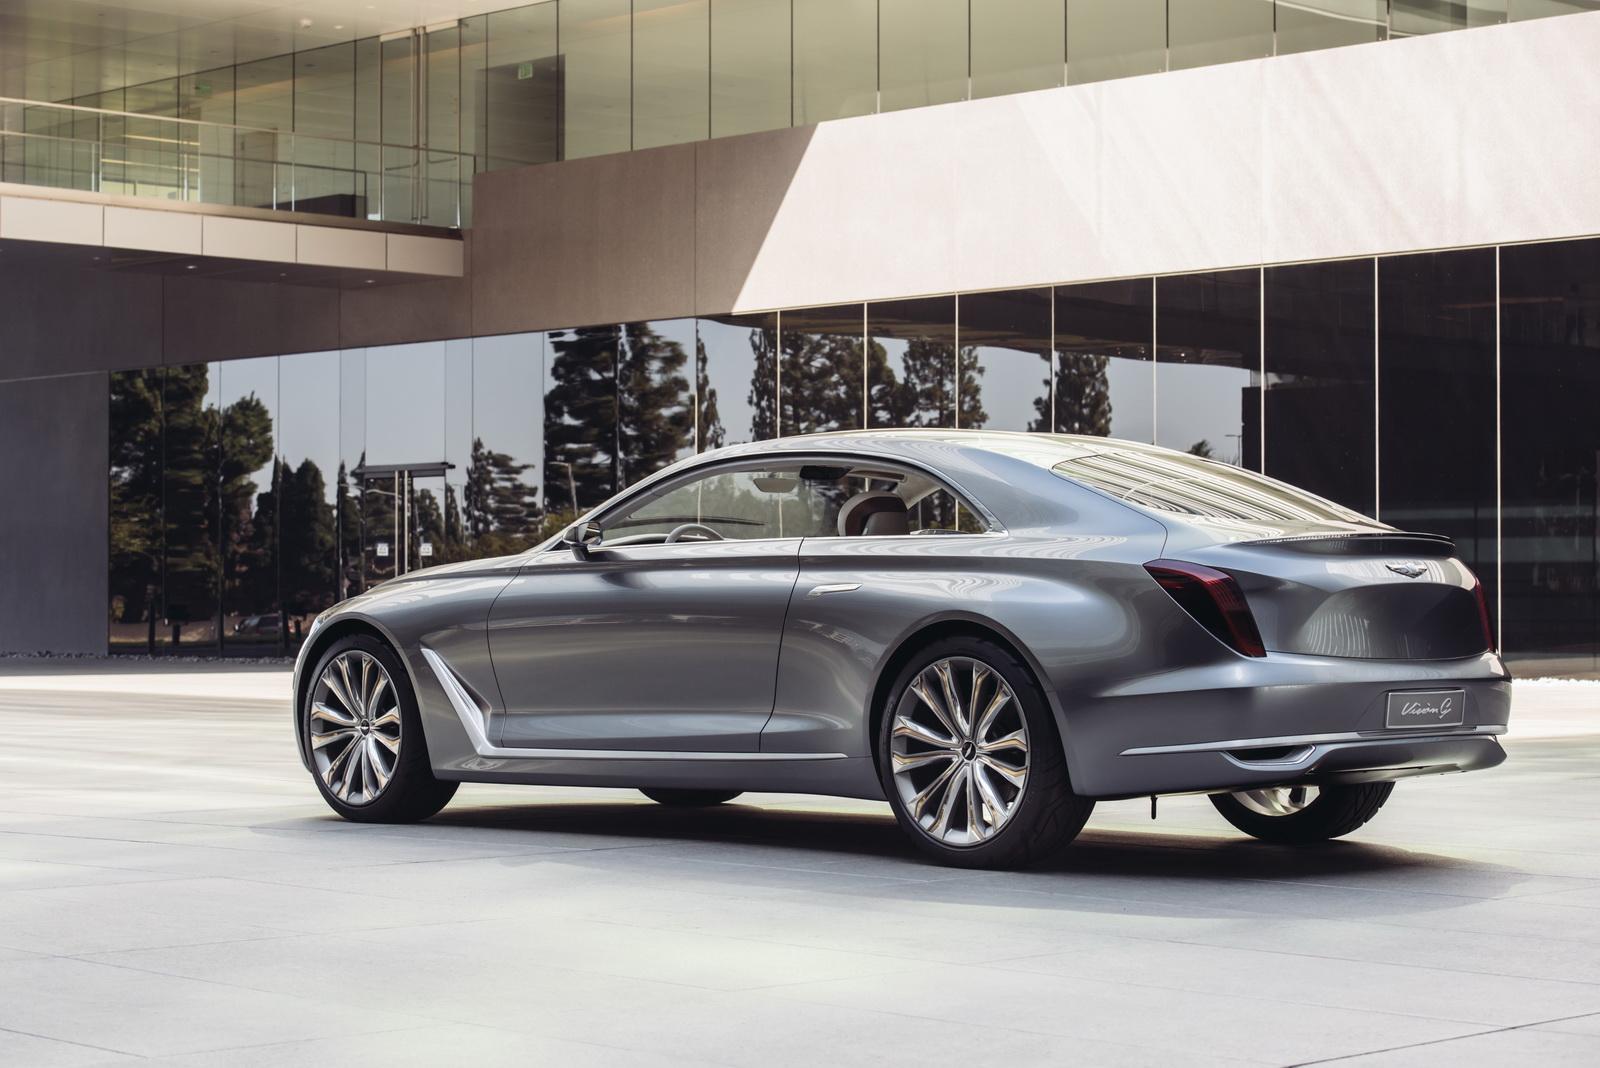 Hyundai Vision G Concept